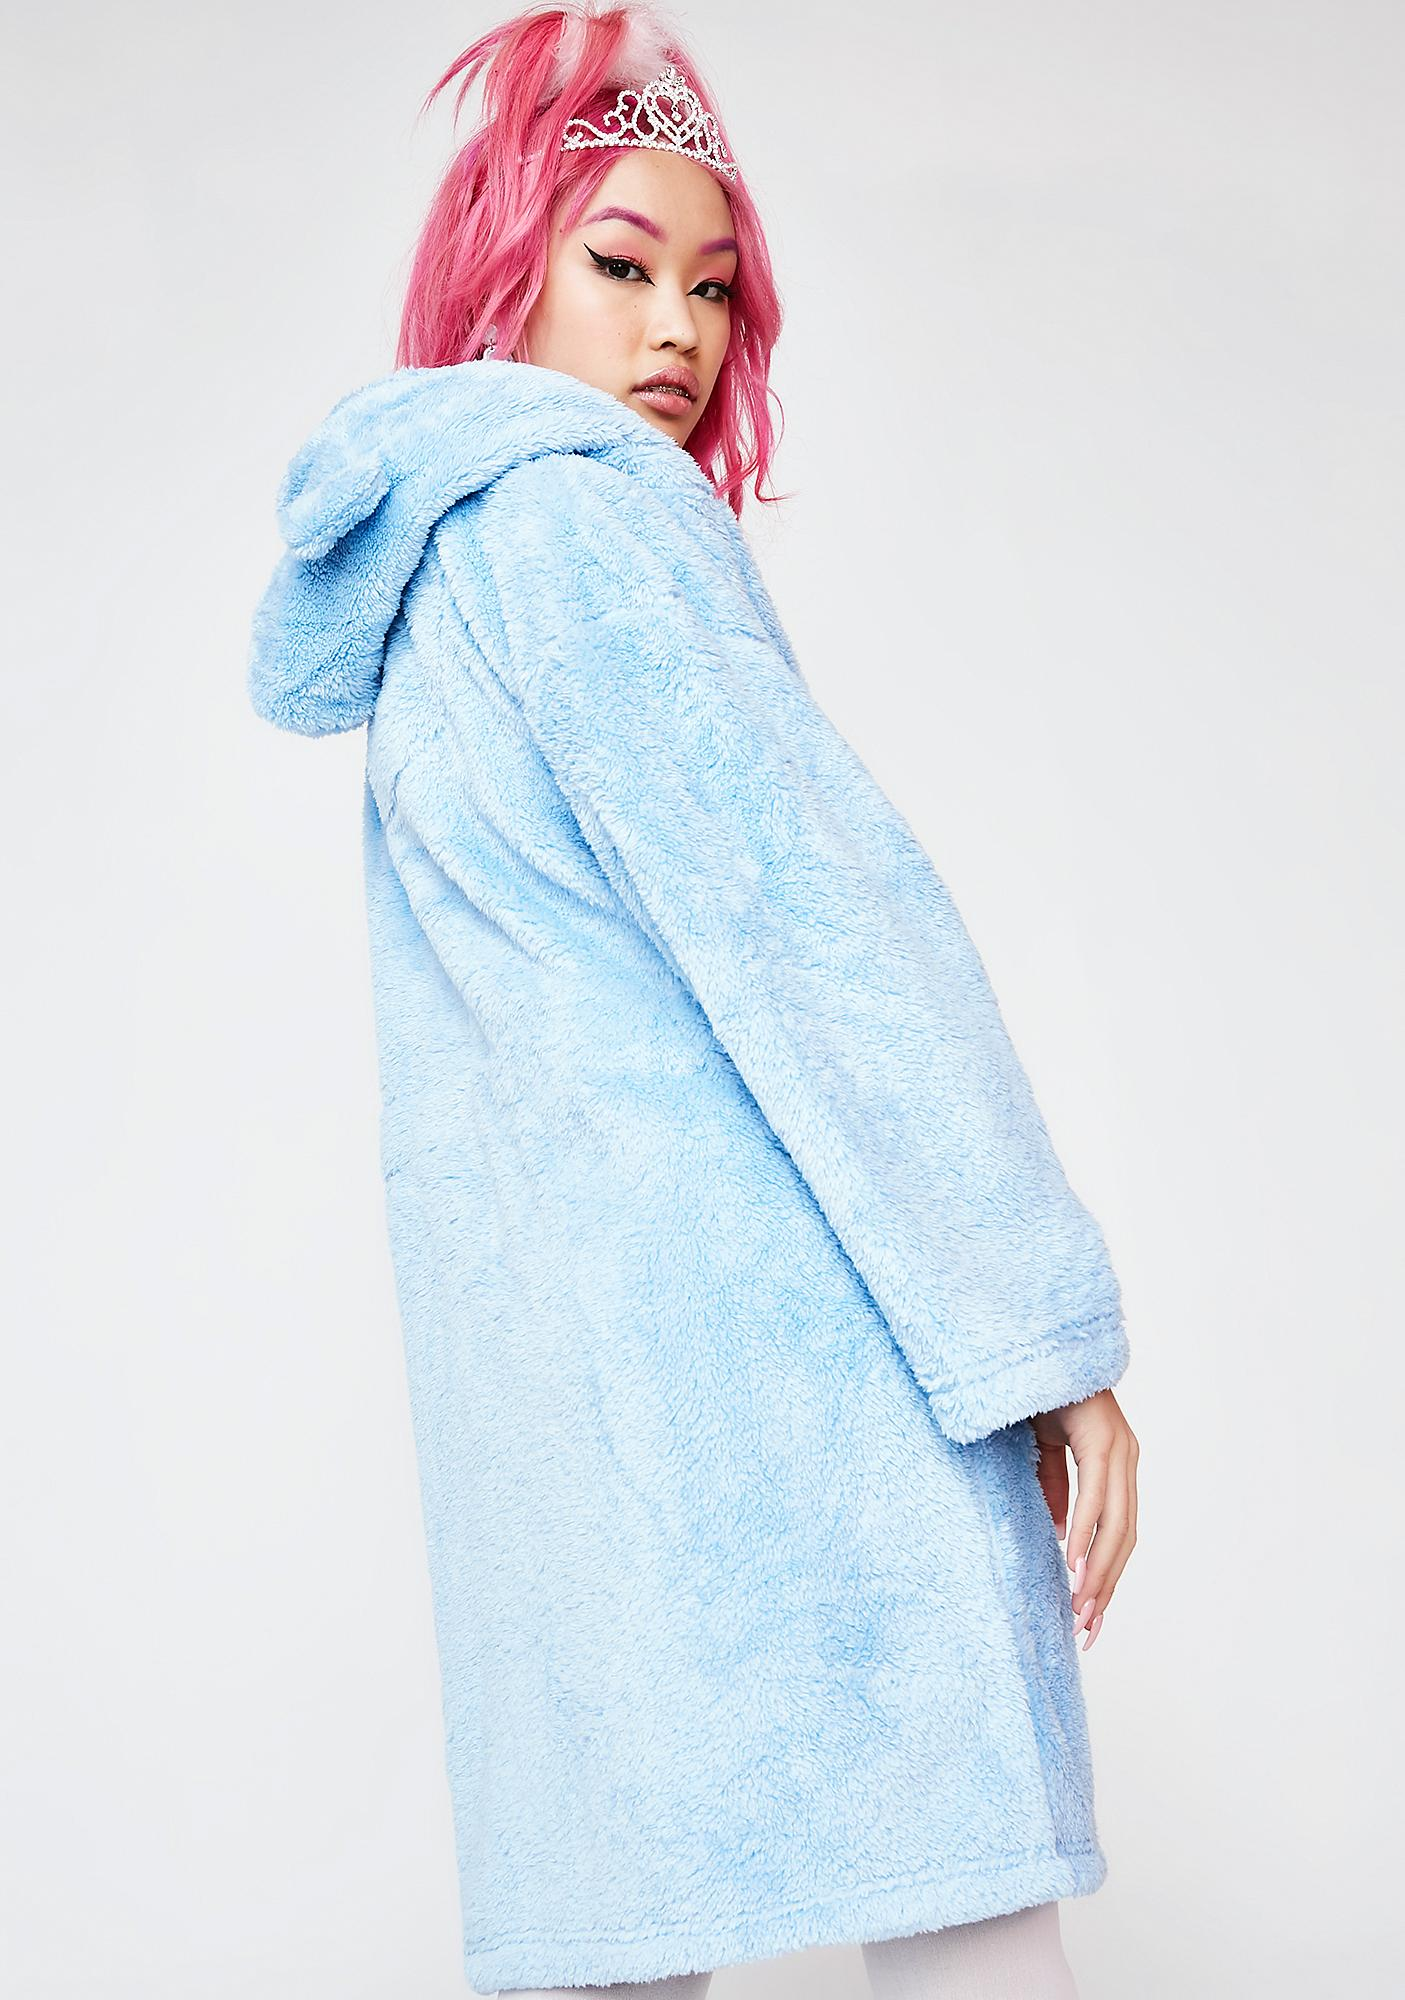 Teddy Bear Hooded Robe